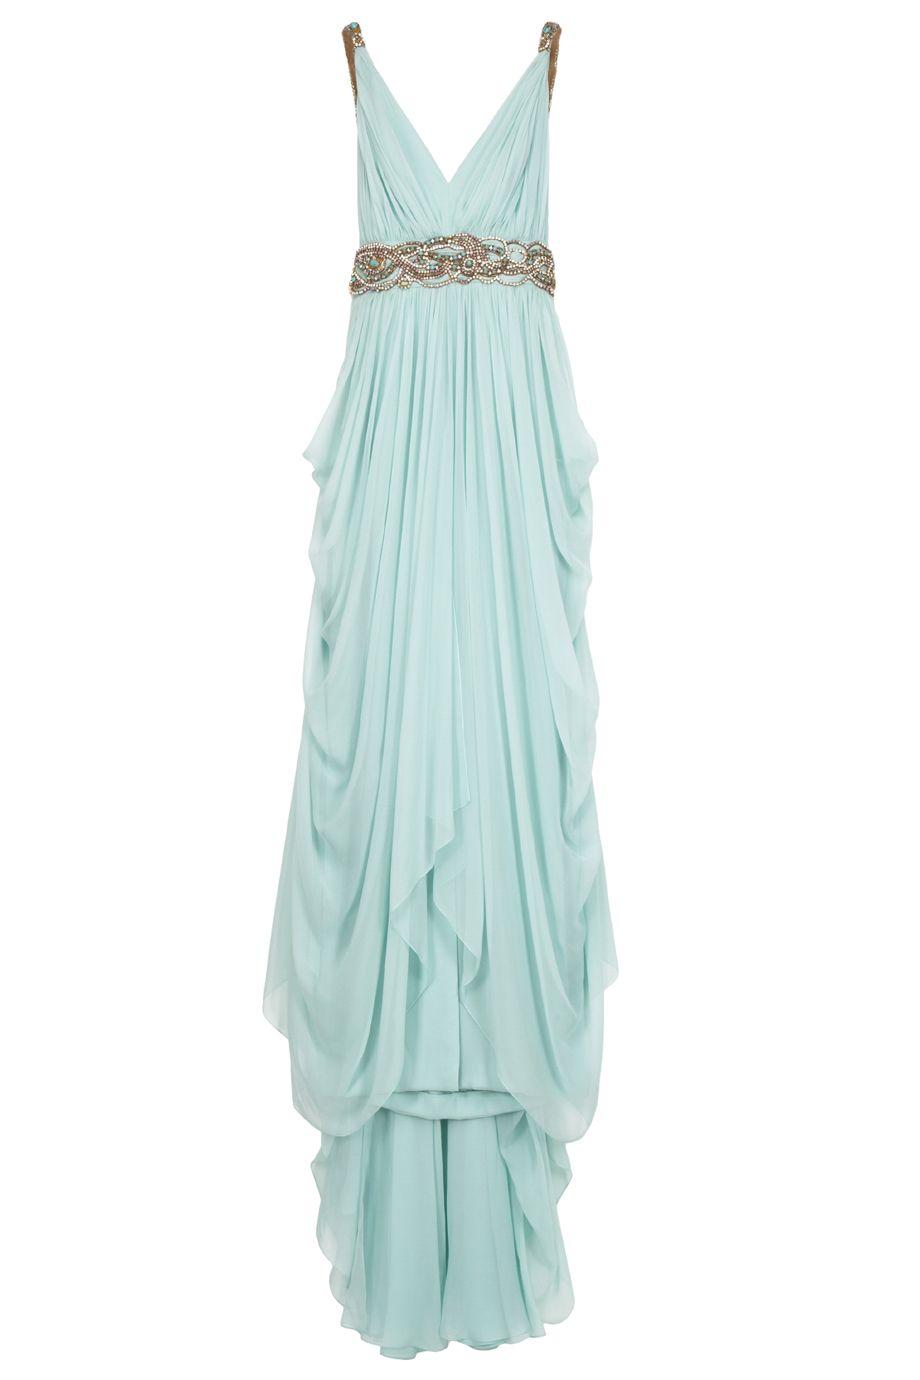 Chiffon Embellished Grecian Gown